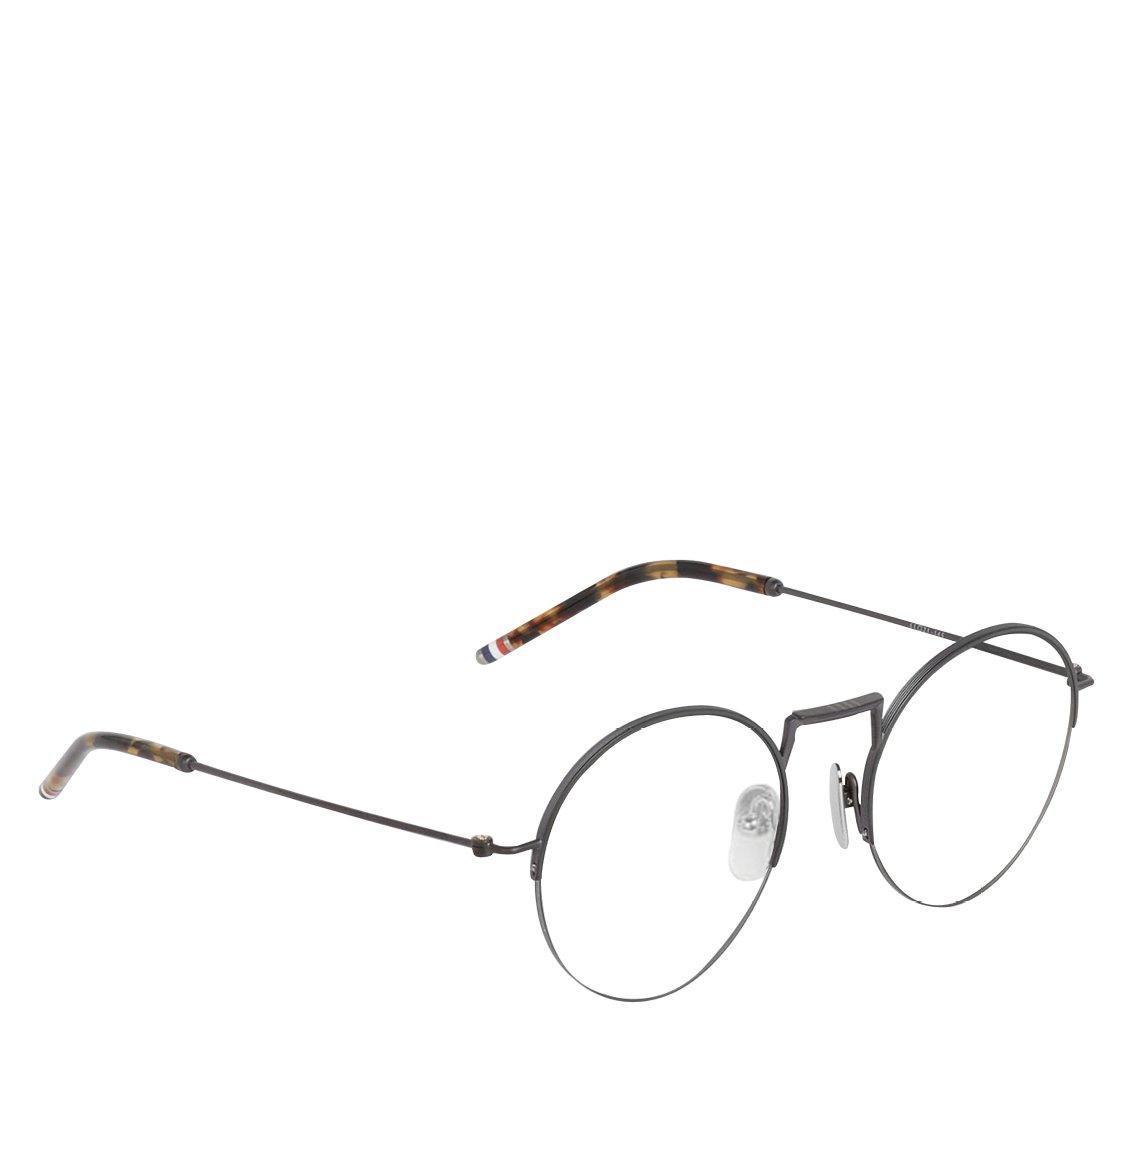 Thom Browne Black Iron Hingless Round Shape Optical Glasses Γυαλιά Οράσεως